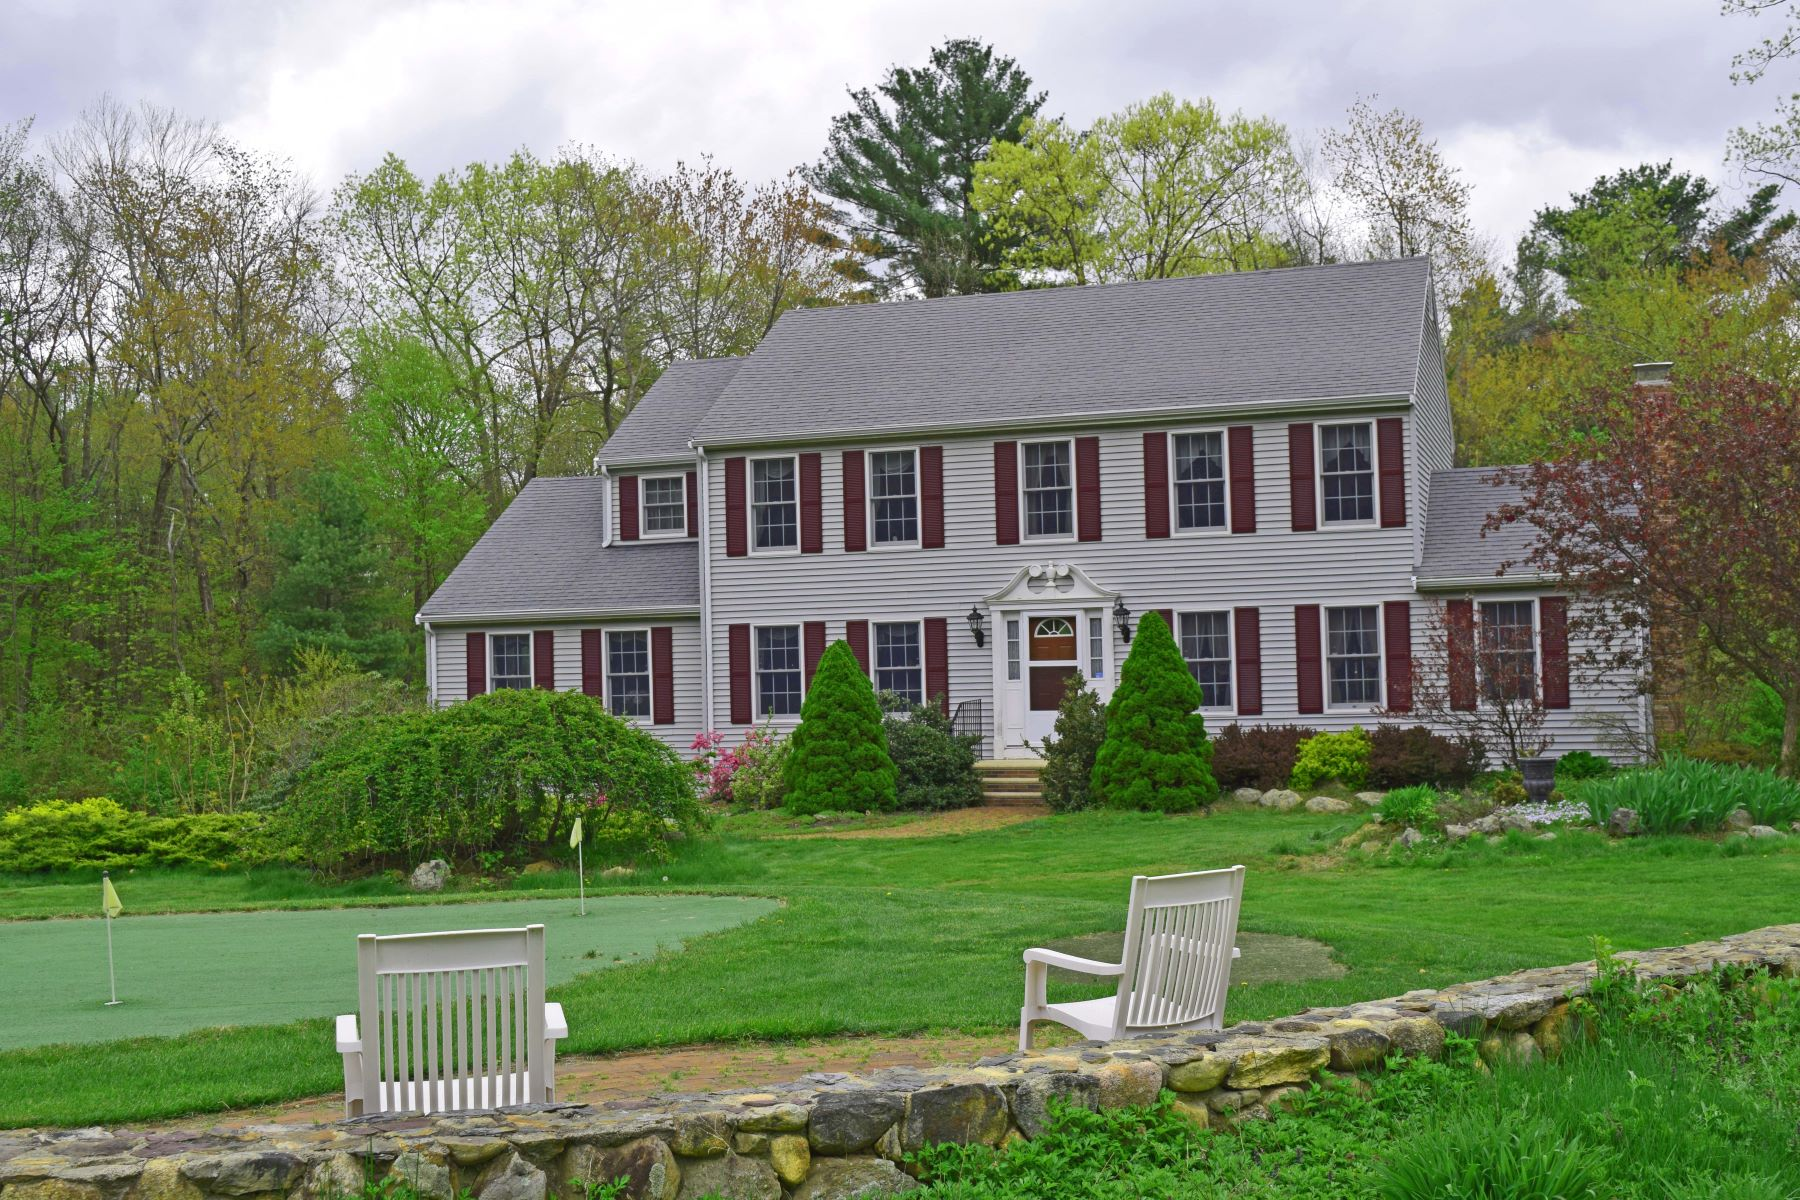 Moradia para Venda às 37 EBH 37 East Bare Hill Road Harvard, Massachusetts, 01451 Estados Unidos